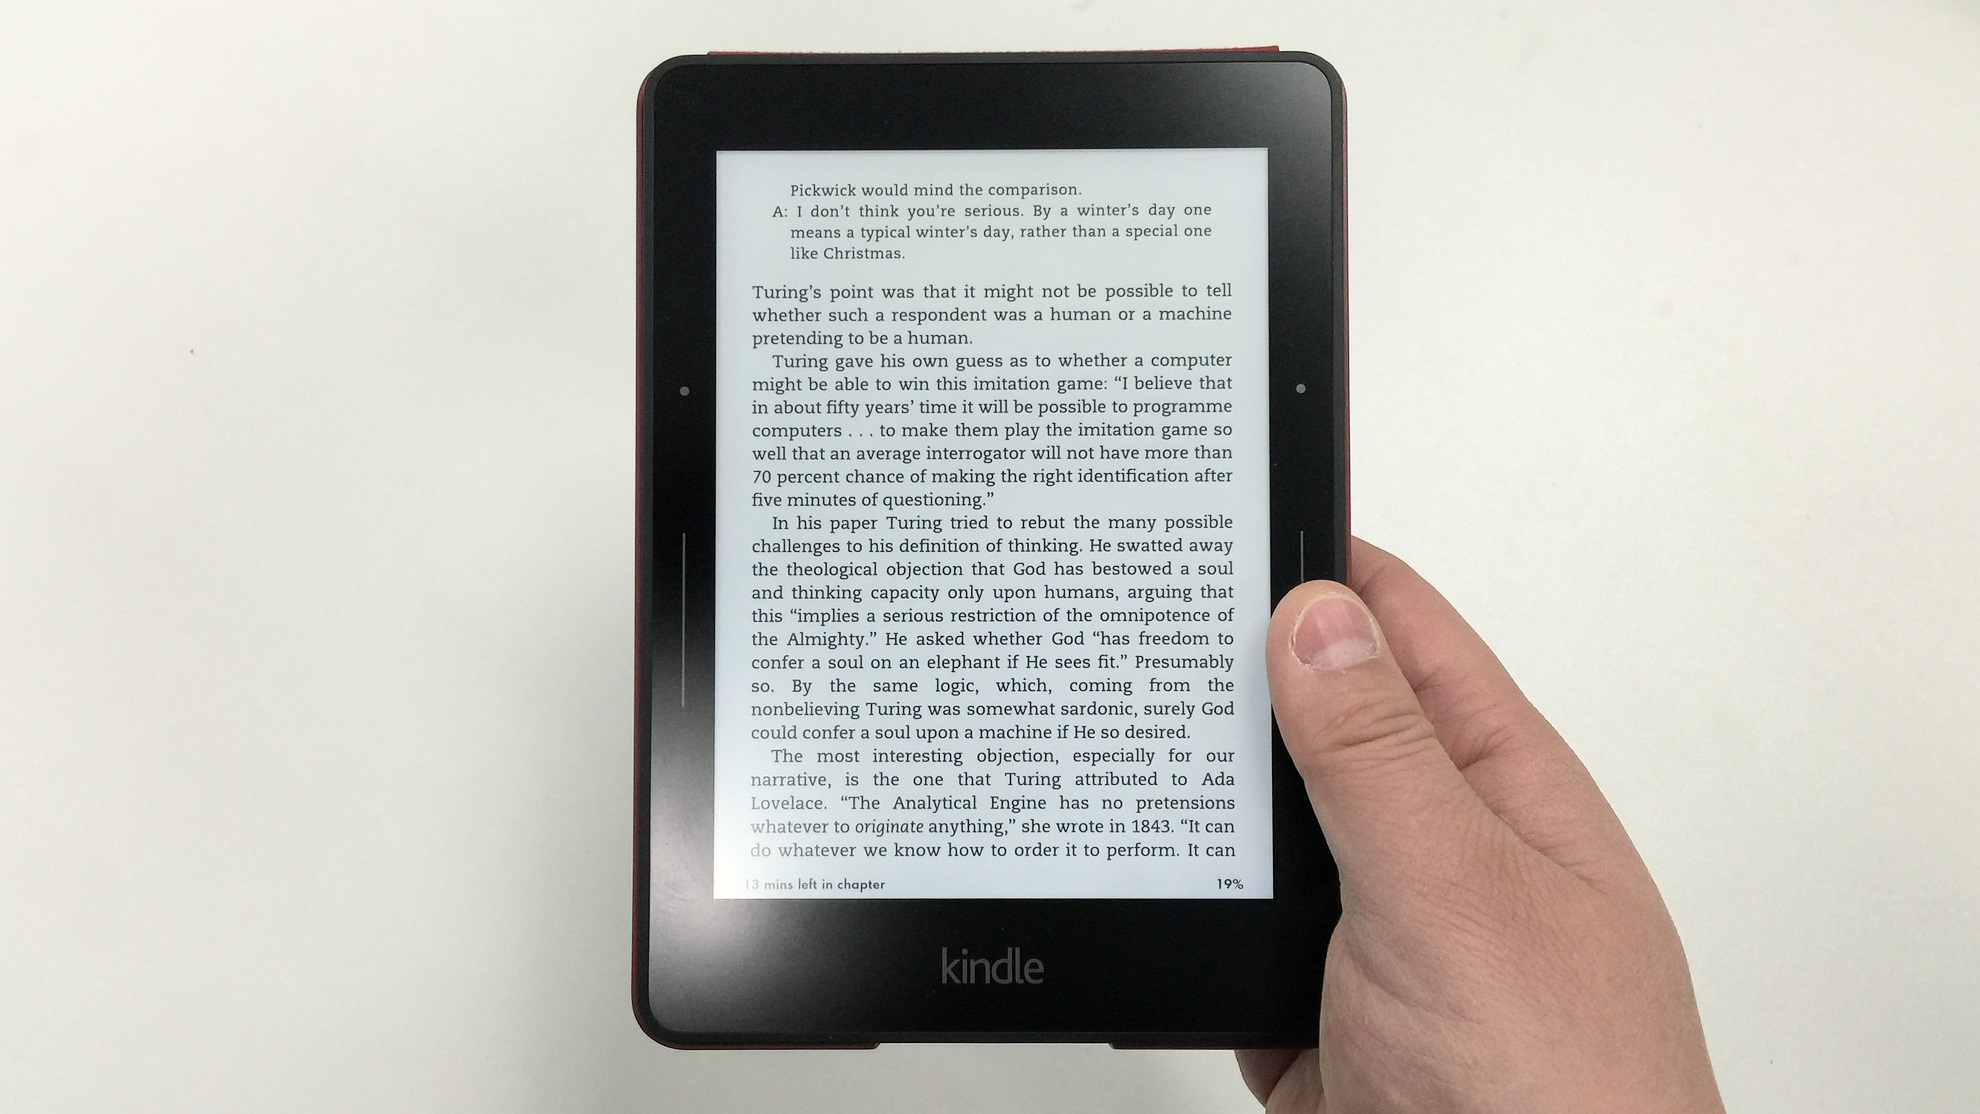 Amazon faz promoção de Kindle e deixa de vender Voyage no Brasil – Tecnoblog